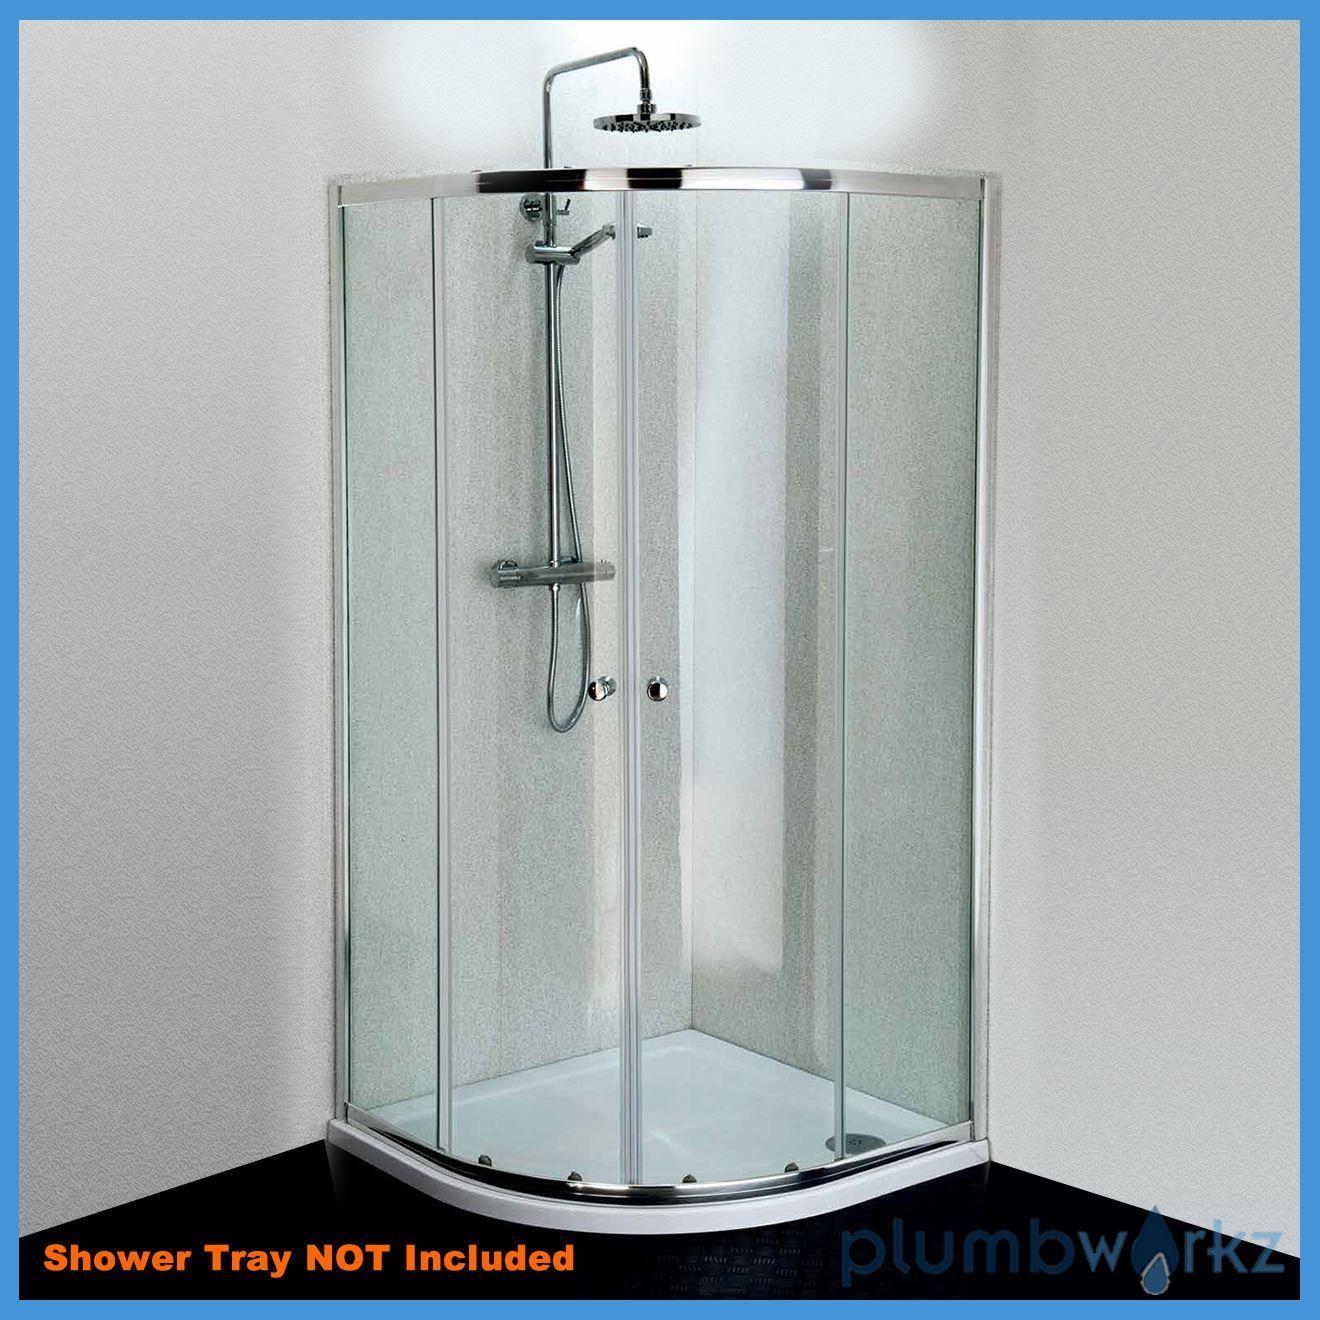 Chrome Quadrant 800mm 900mm Shower Enclosure Cubicle Glass Door